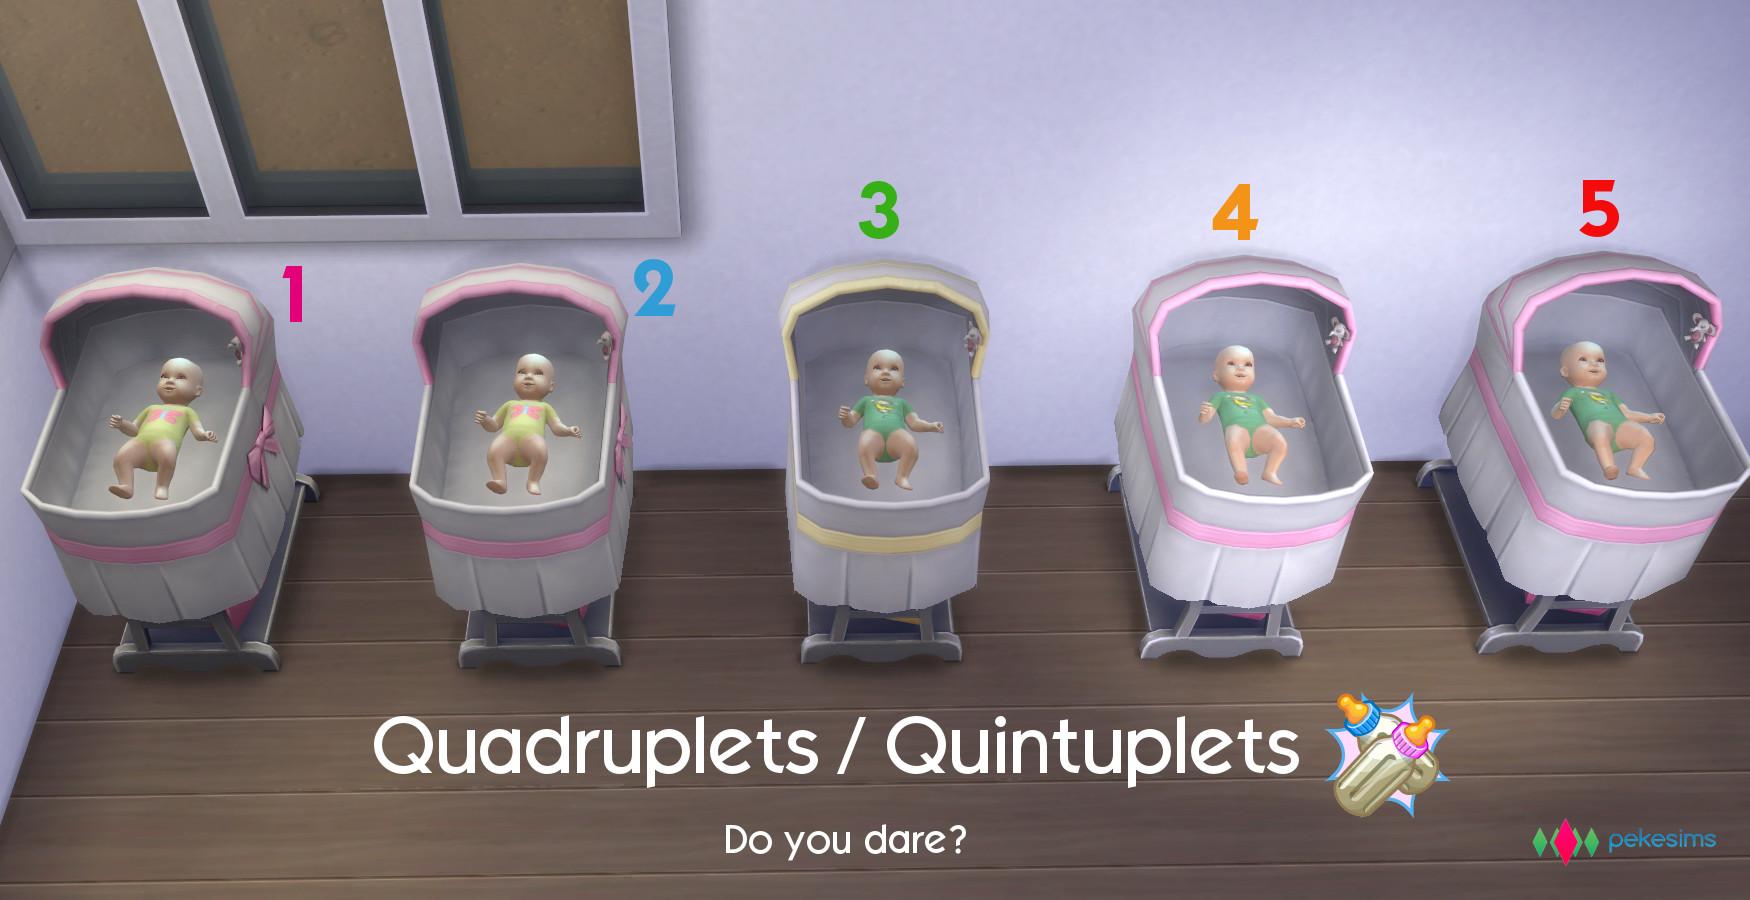 MTS_pekesims-1494741-pekesims_quadruplets-quintuplets.jpg